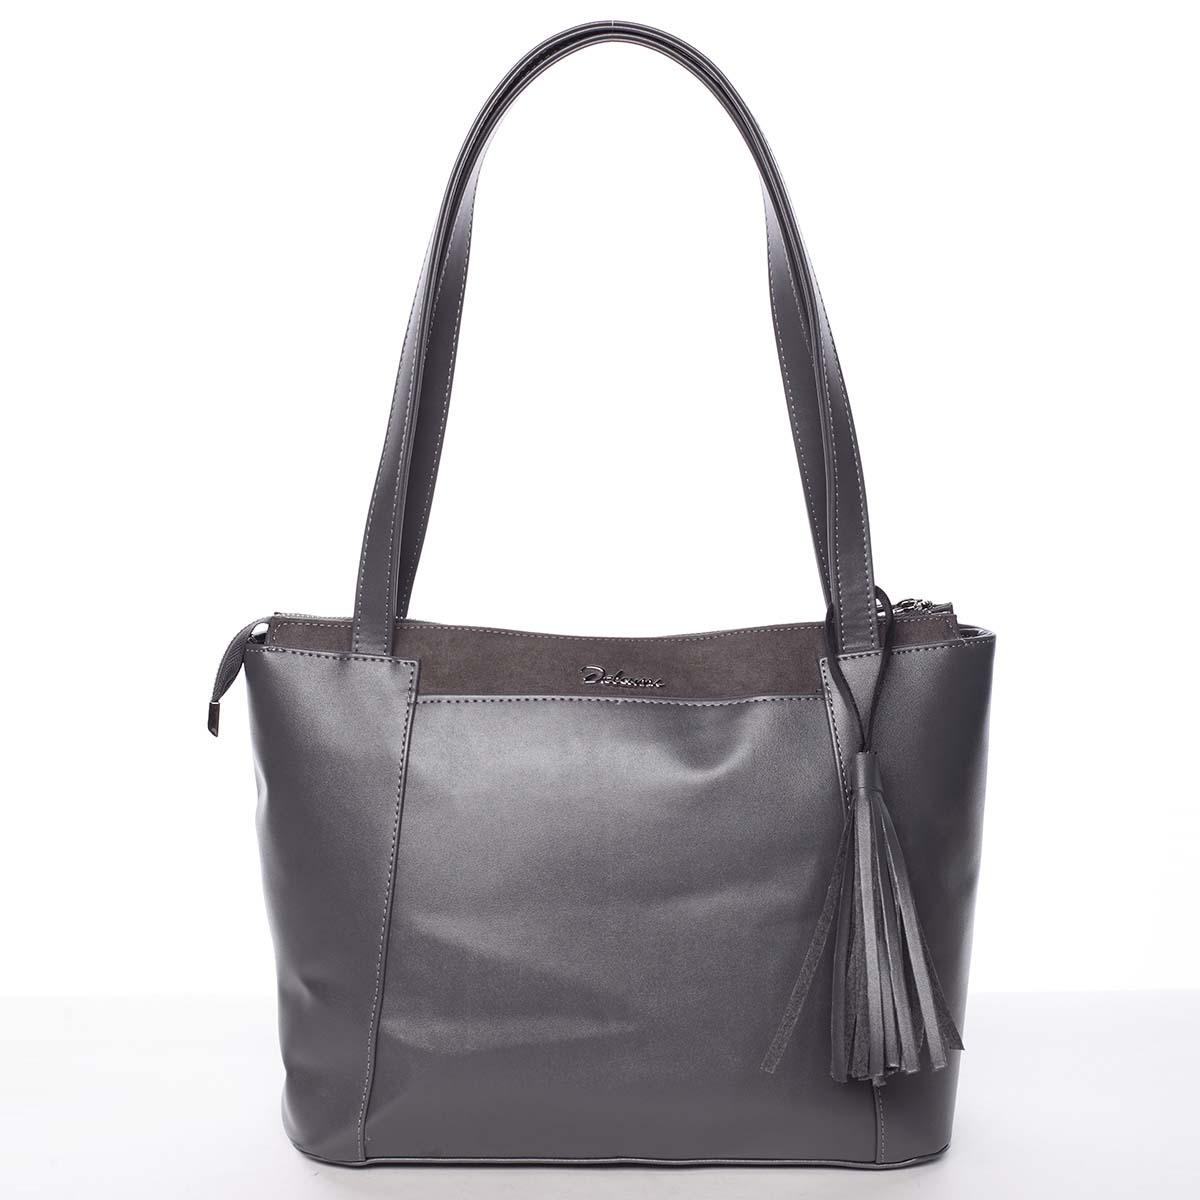 Moderná pevná kabelka sivá - Delami Hope